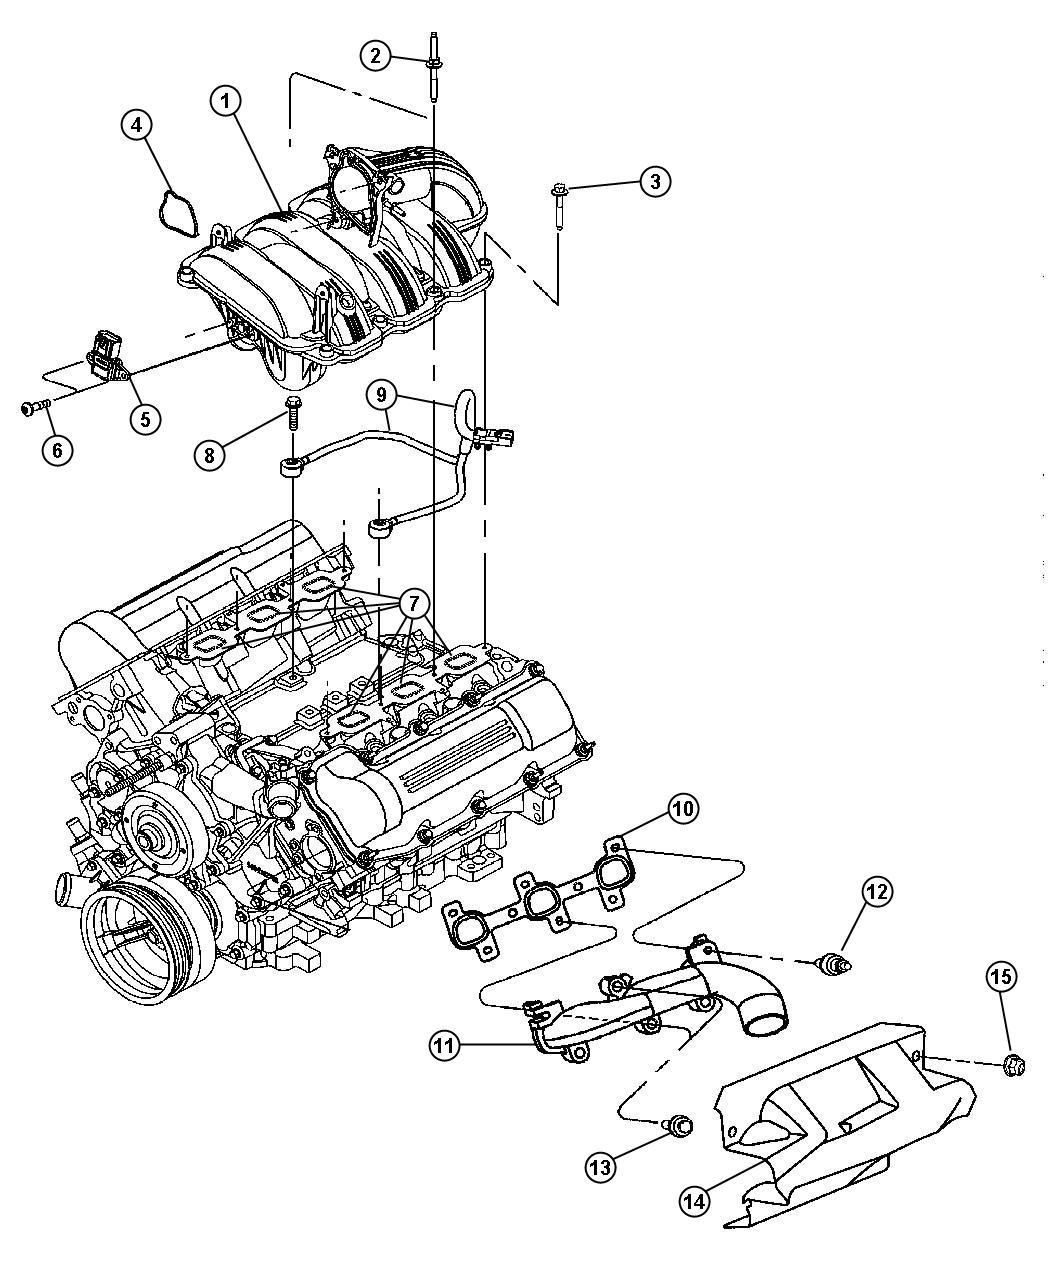 dodge dakota suspension parts diagram 2000 grand am rear search engine get free image